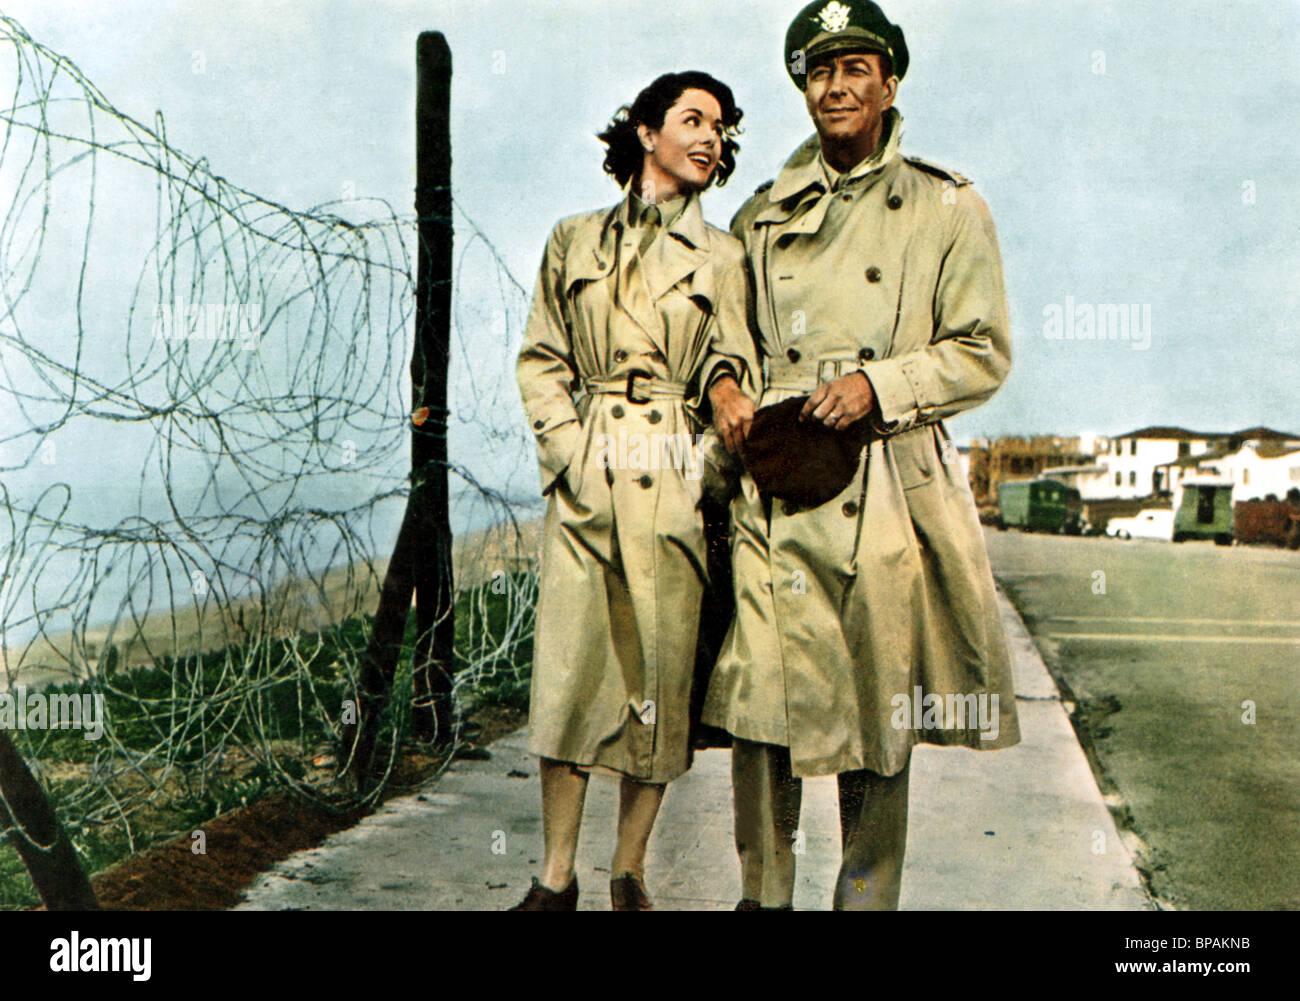 DANA WYNTER, ROBERT TAYLOR, D-DAY THE SIXTH OF JUNE, 1956 - Stock Image